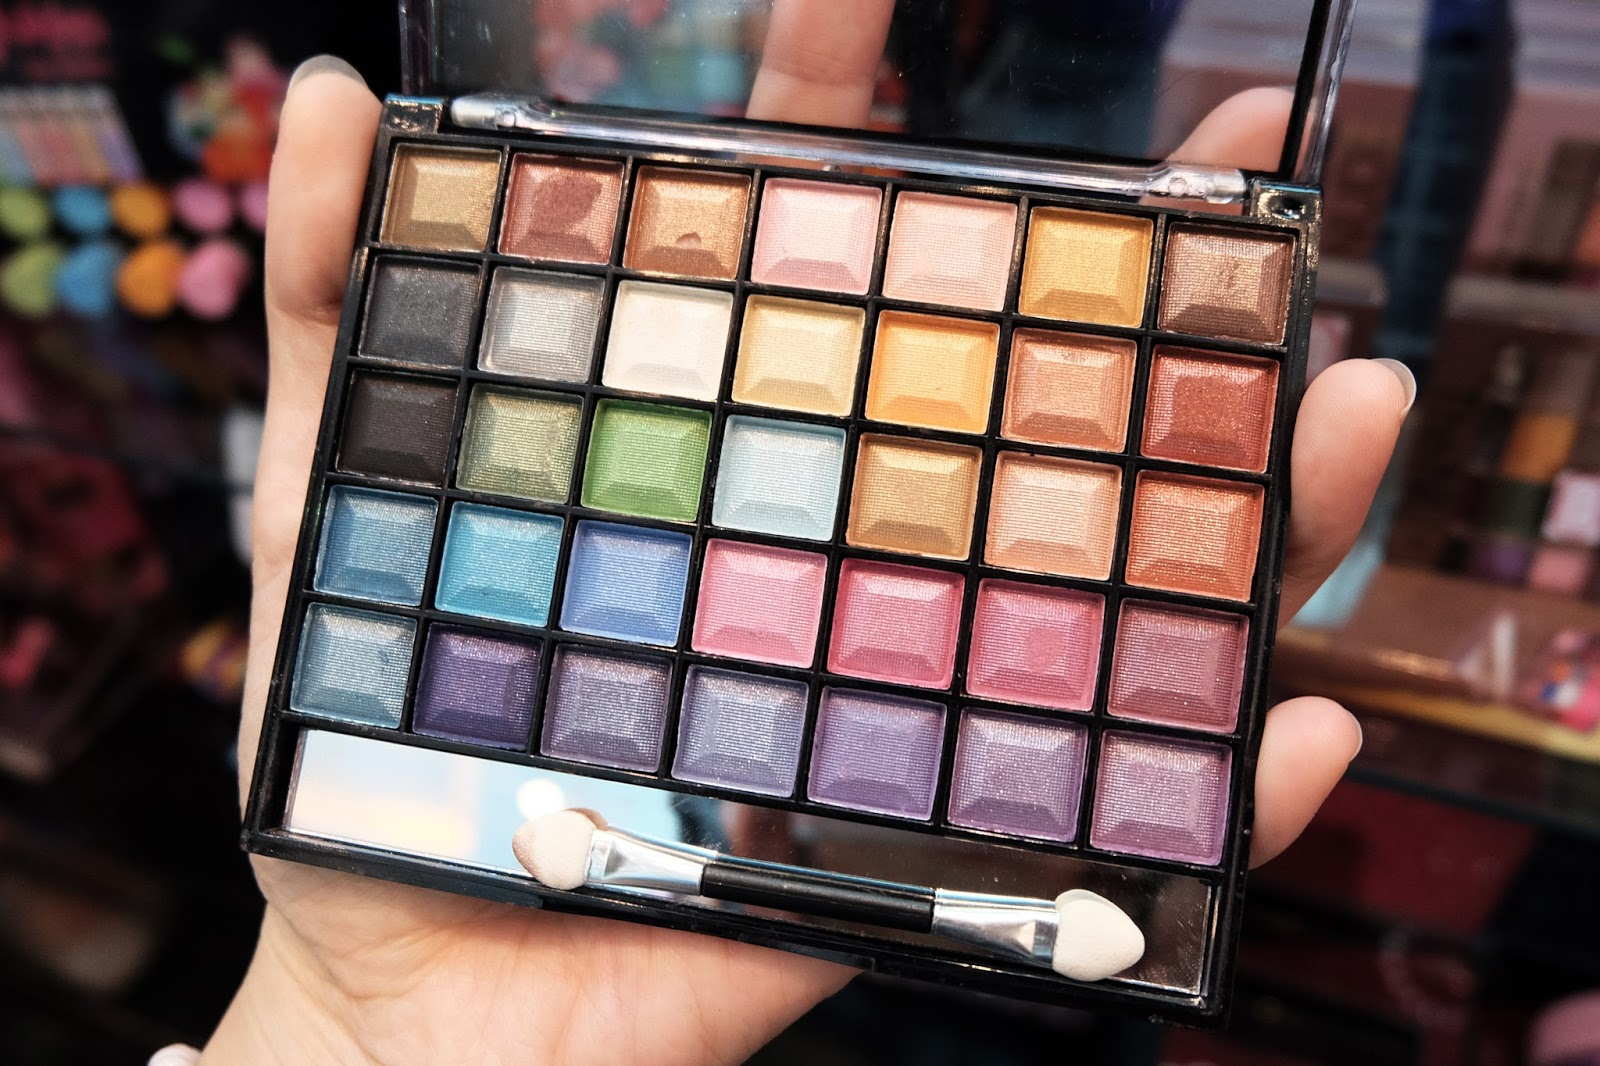 mukka kosmetik 35 color eyeshadow palette | bigdreamerblog.com